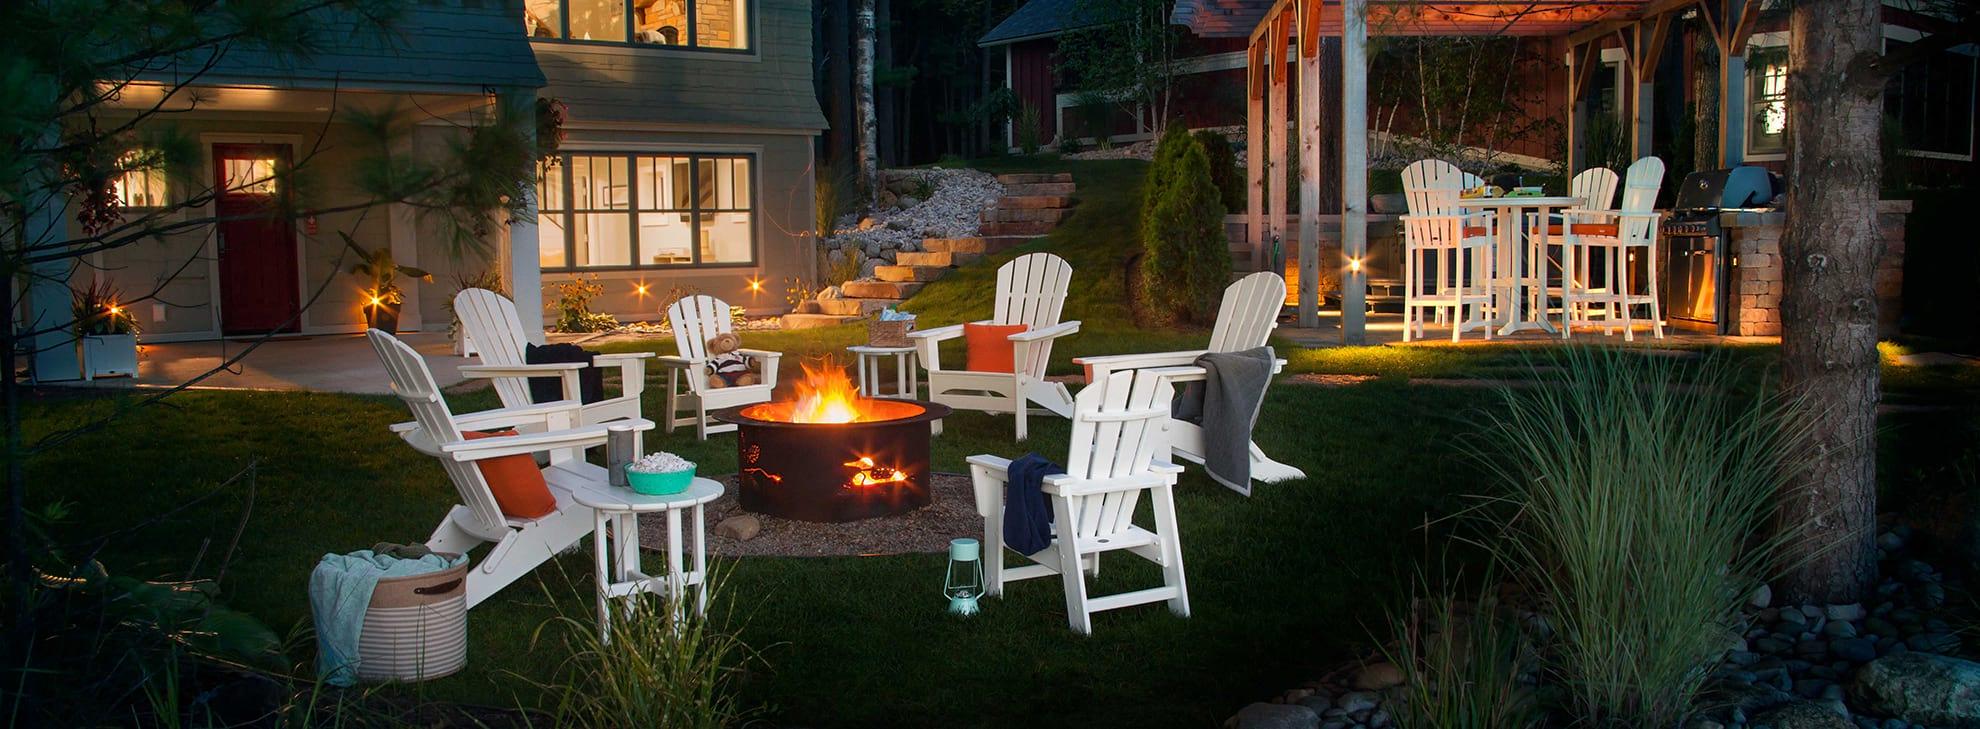 Palm Coast chairs around a firepit